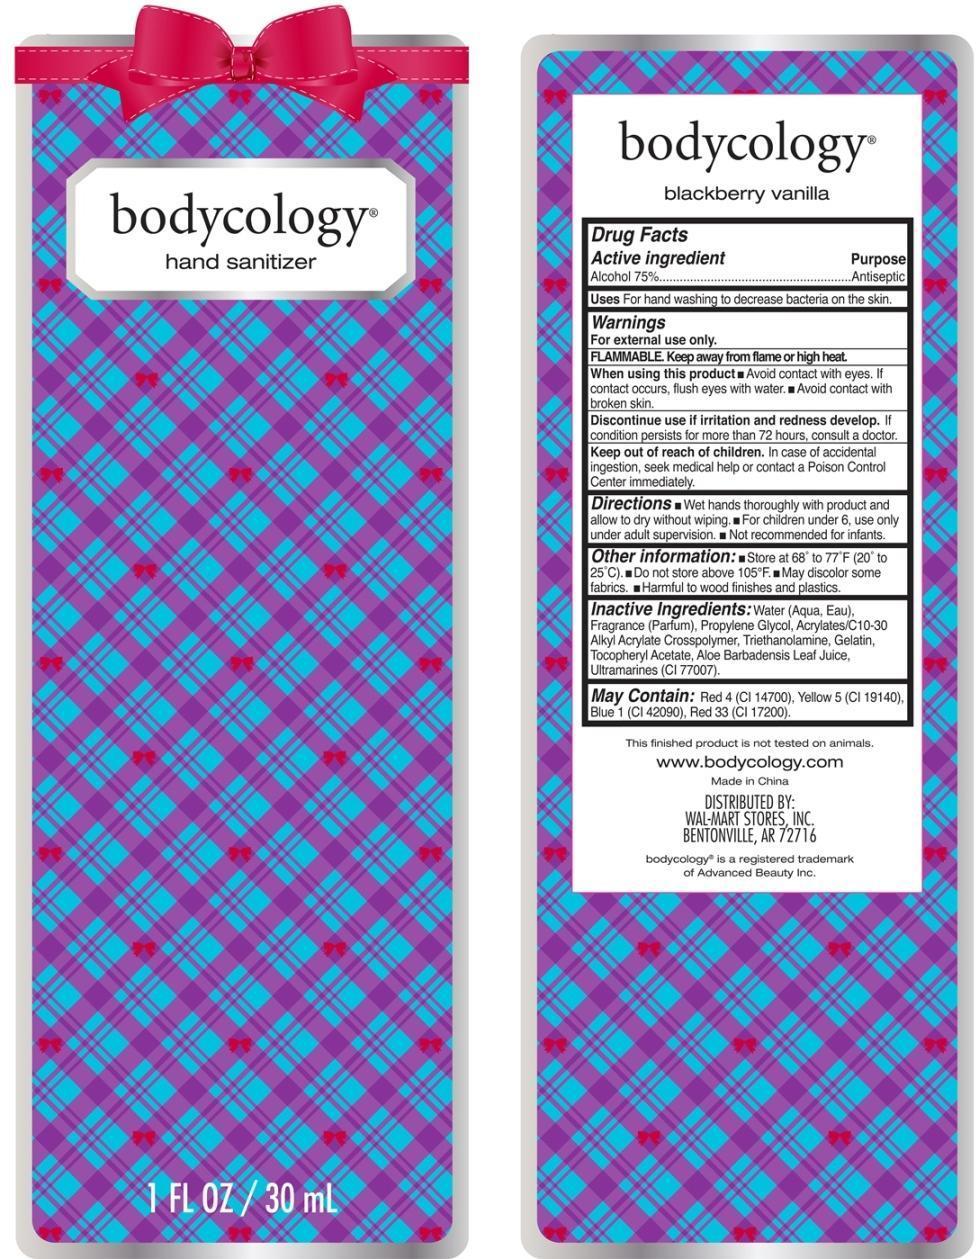 Blackberry Vanilla Hand Sanitizer Bodycology (Alcohol) Liquid [Wal-mart Stores Inc]